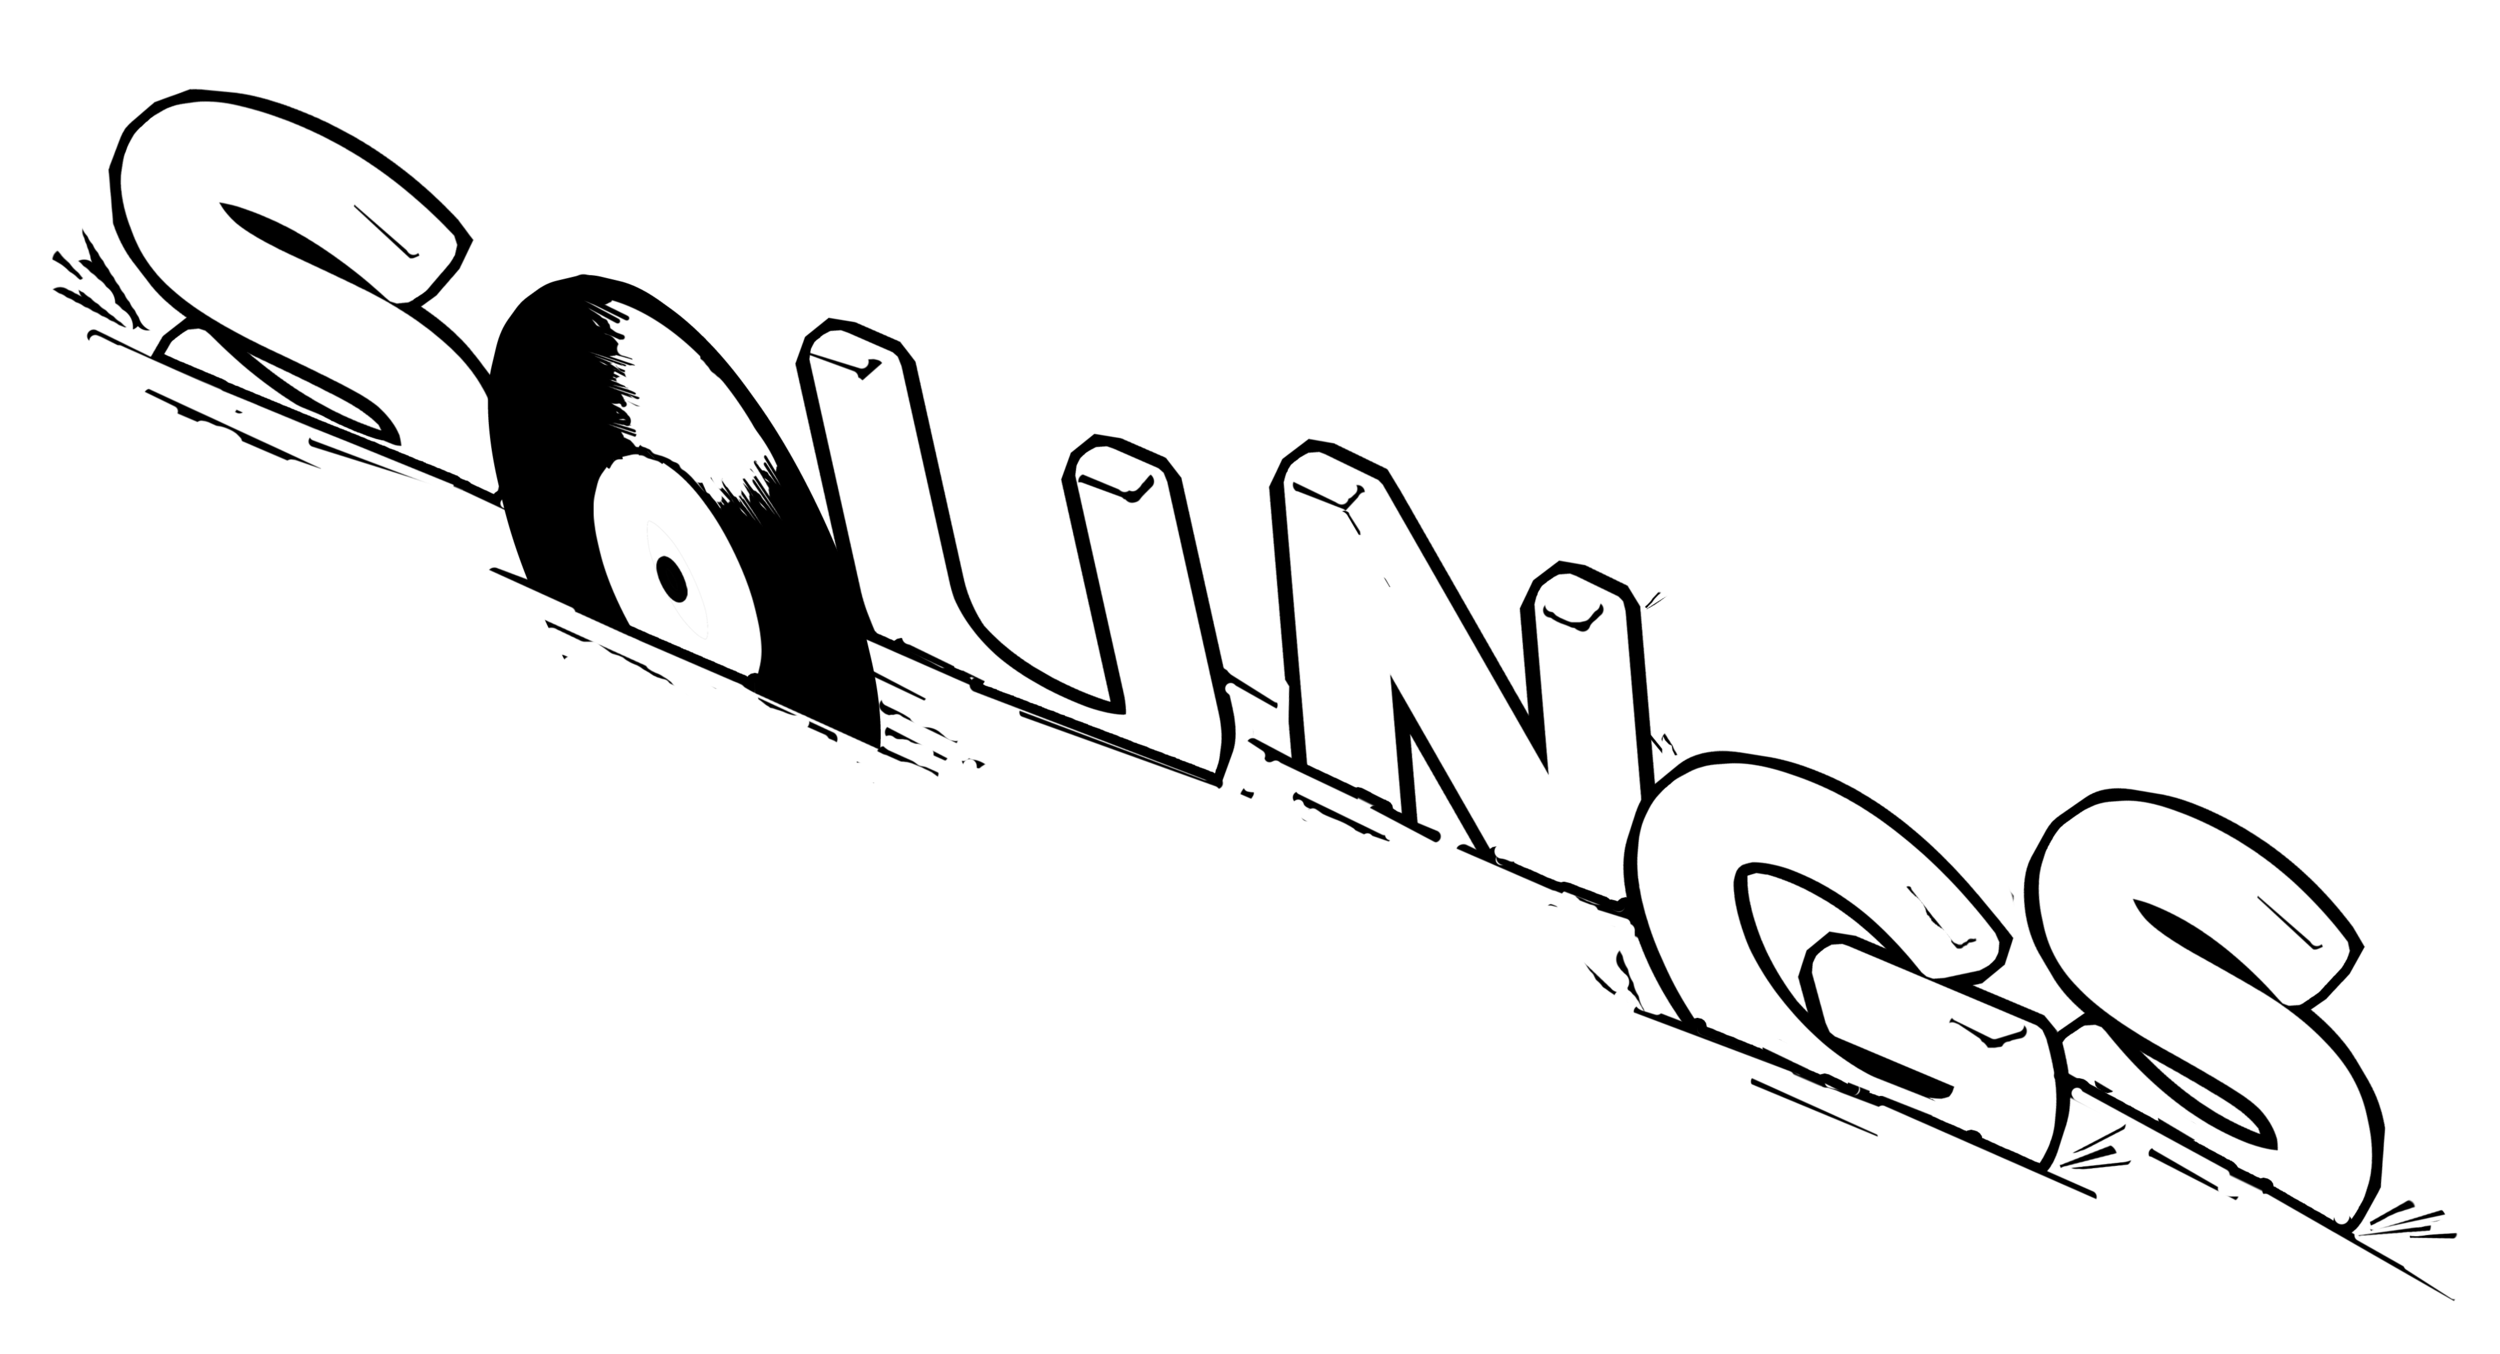 soungs logo.png